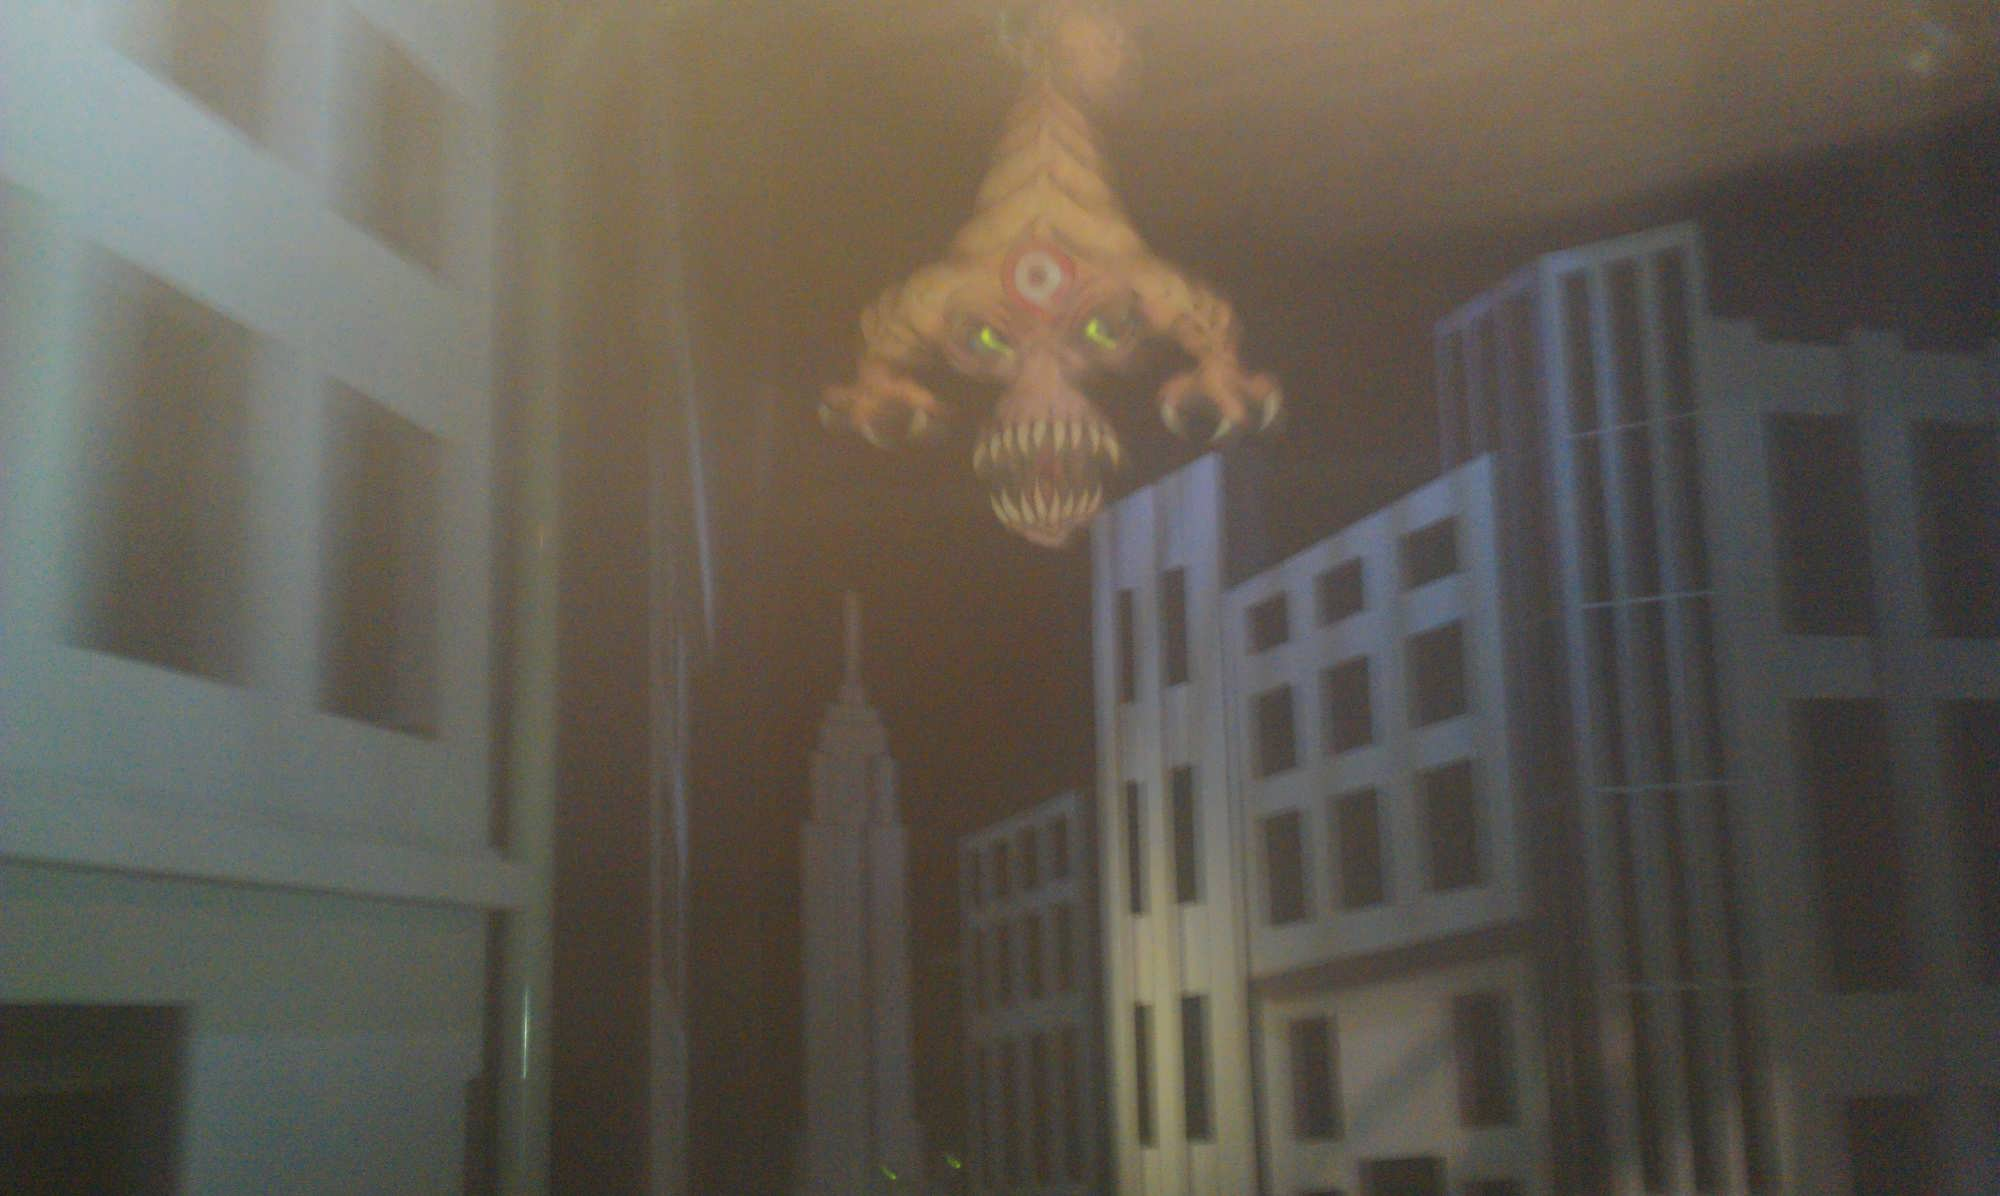 Alien targets hang from the ceiling in Men in Black: Alien Attack